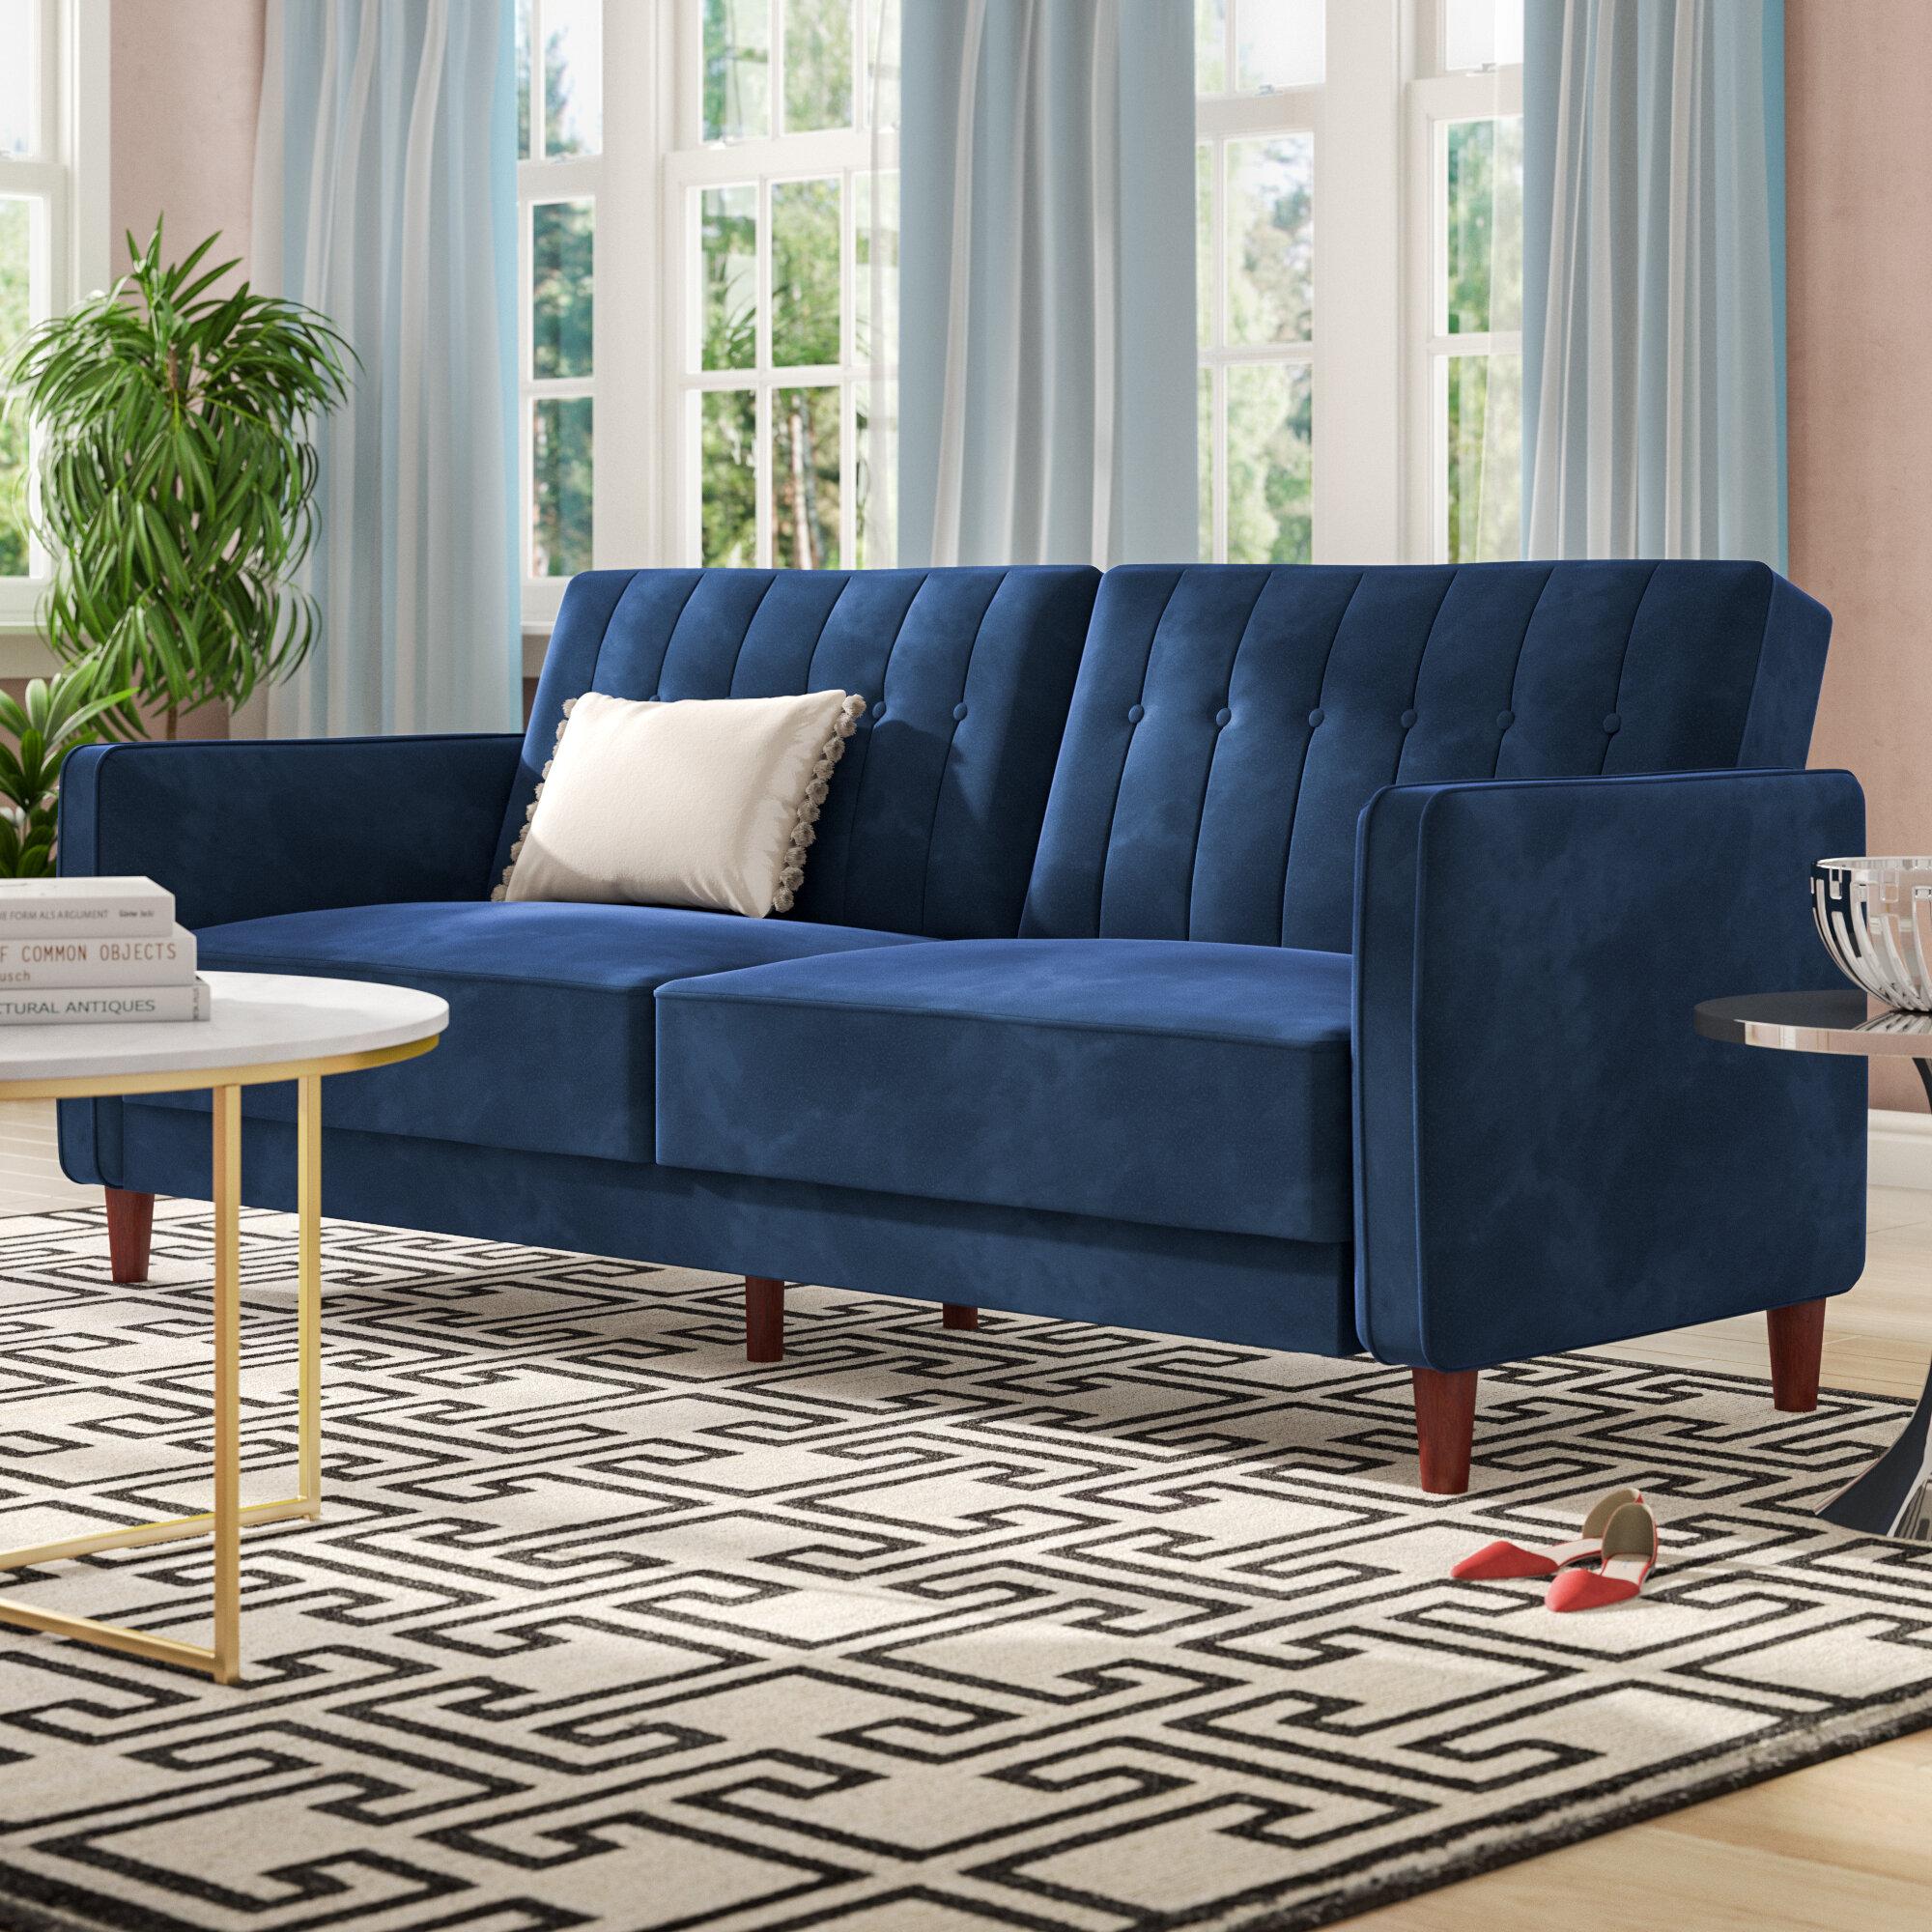 Willa Arlo Interiors Nia Pin Tufted Convertible Sofa & Reviews | Wayfair